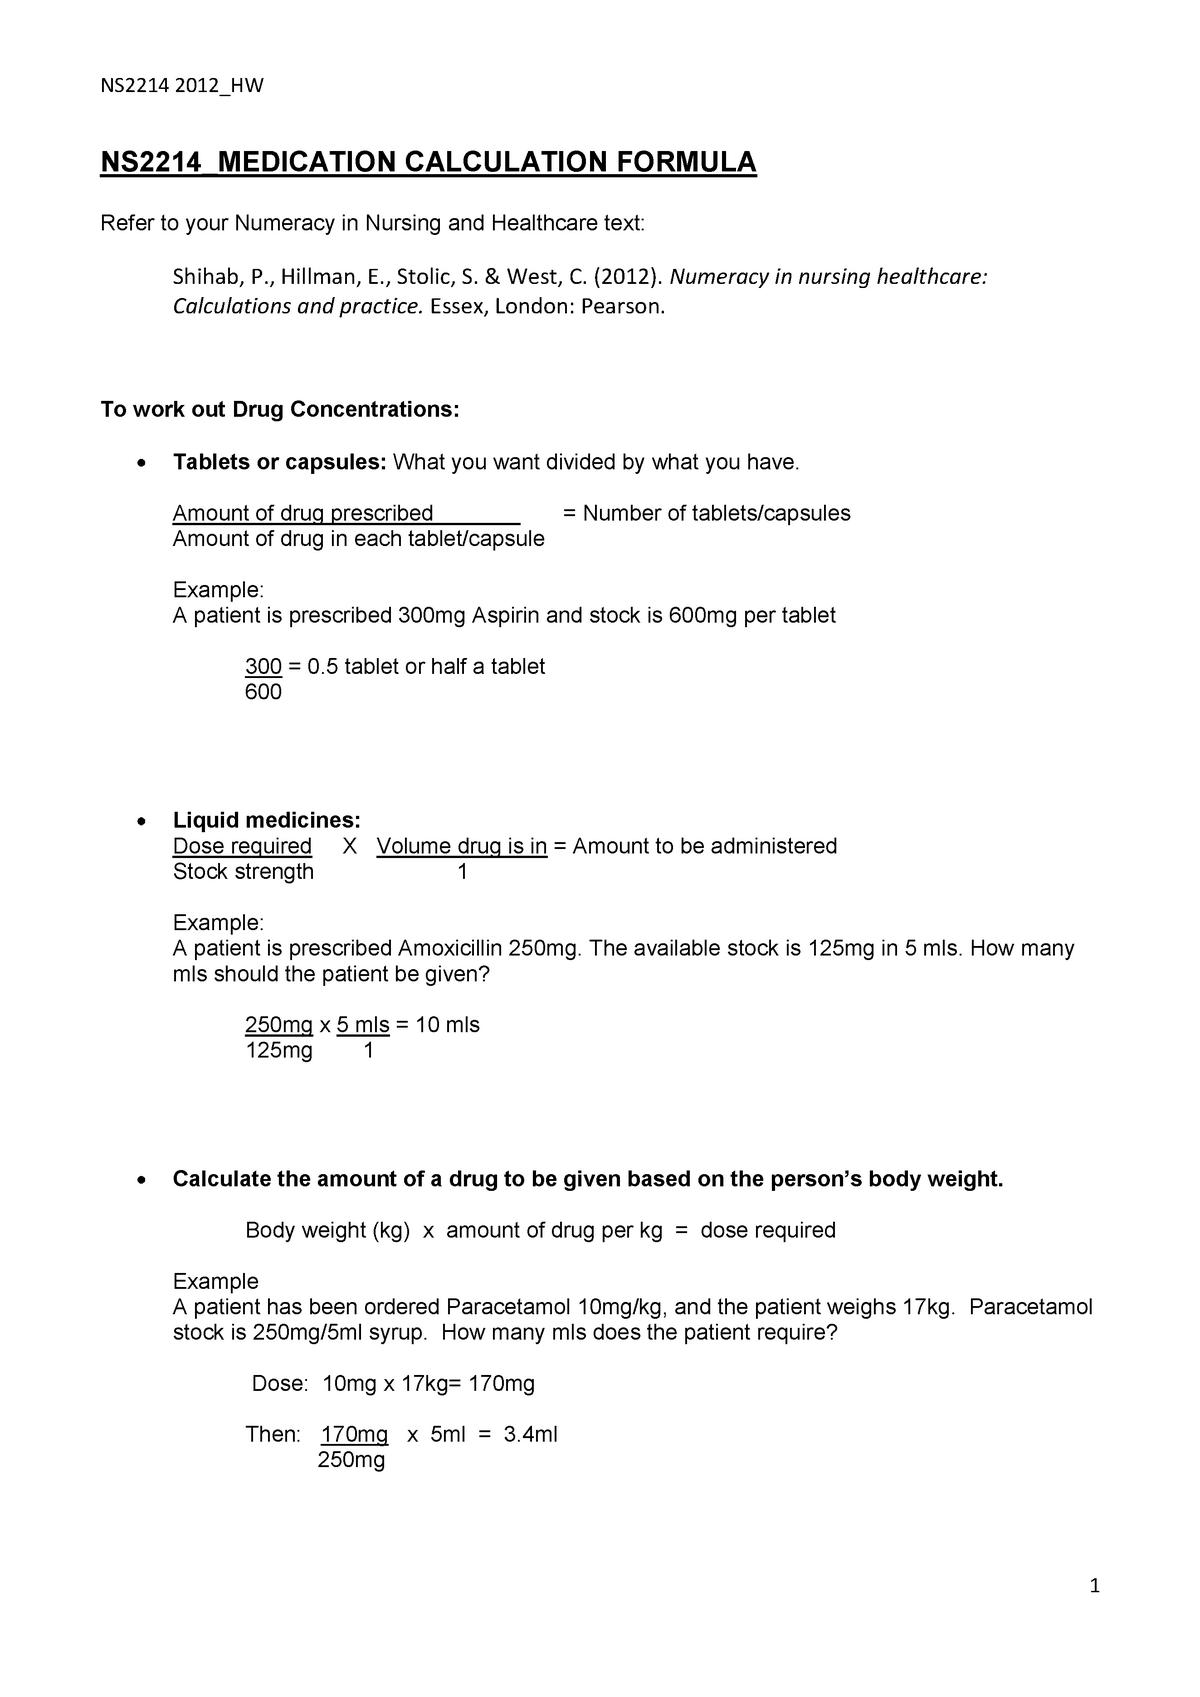 Med calculation formulas - NS2214:03: Clinical Nursing Practice 4